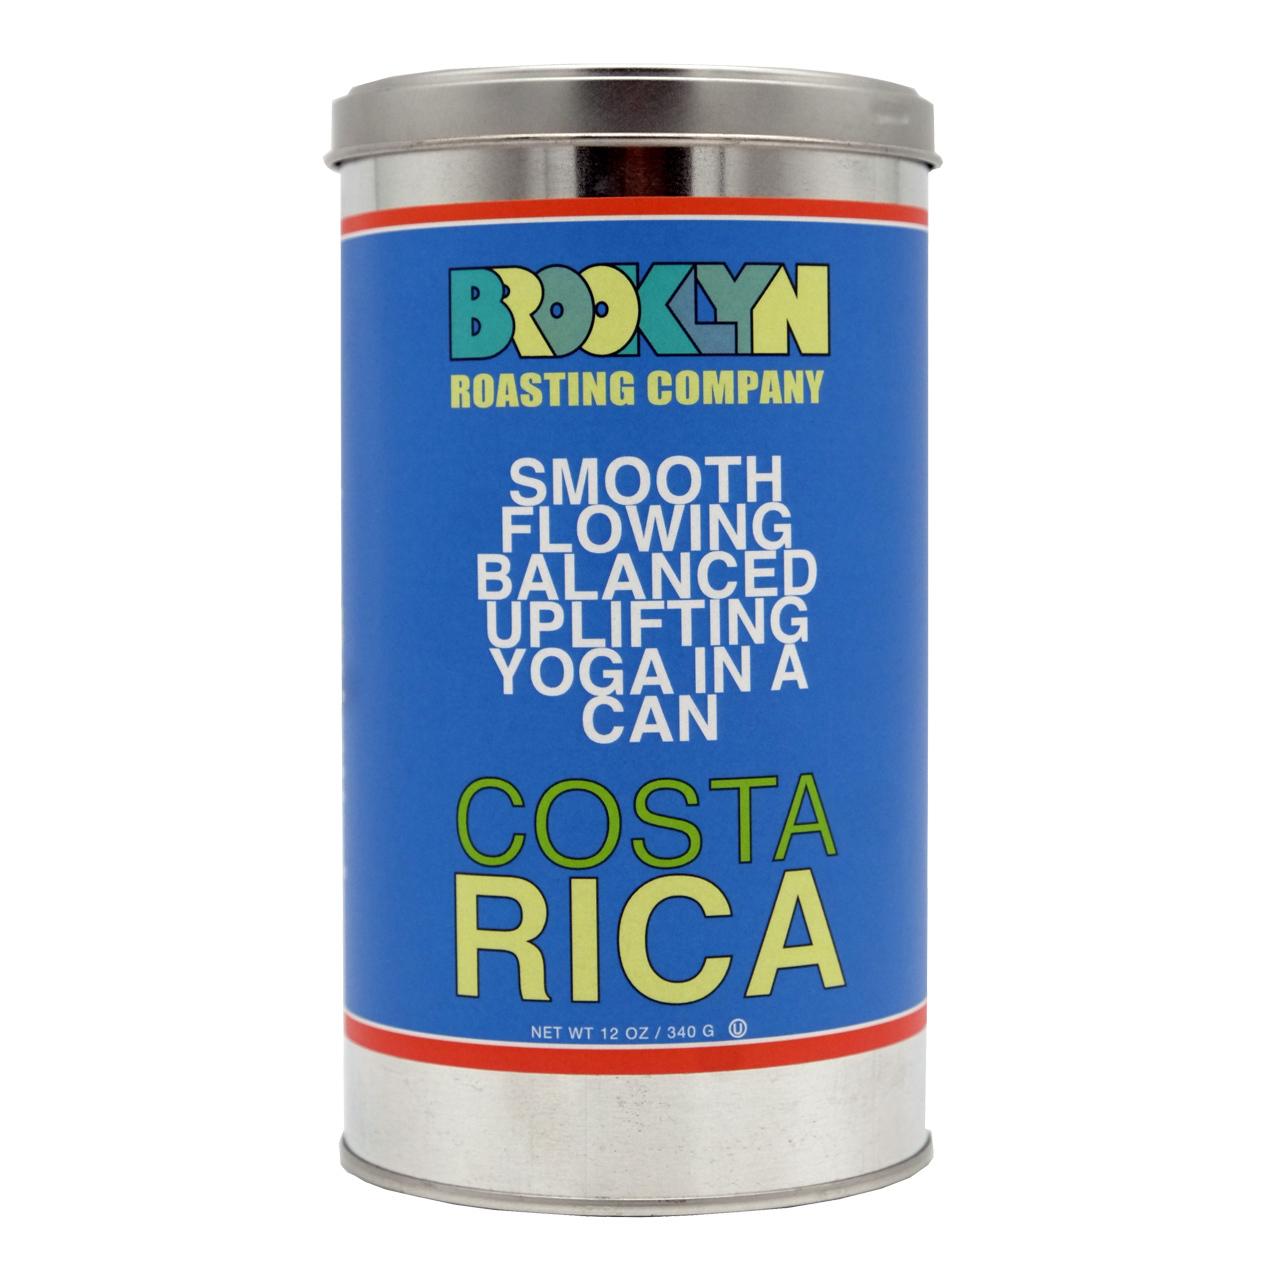 < Best by 2020.6.20 > Costa Rica 12oz ティン缶入り(340g)